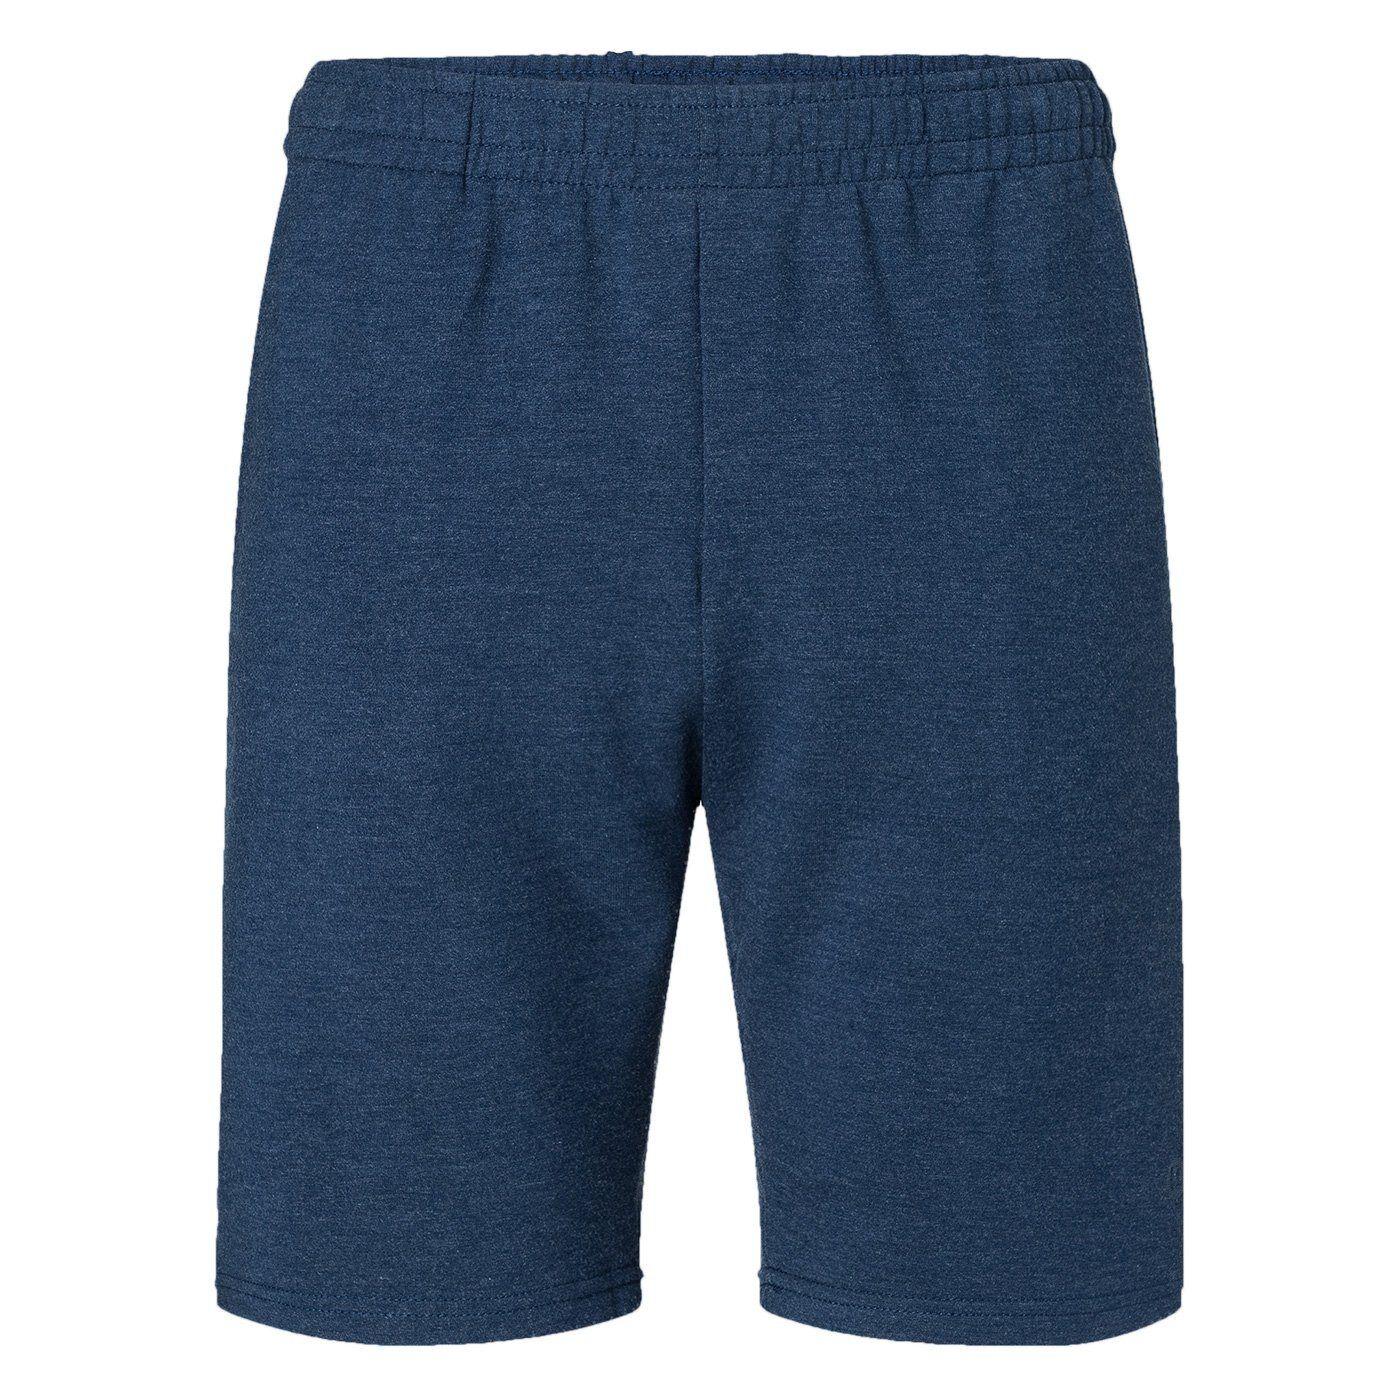 DEPROC Active Shorts »KENTVILLE MEN Sport &Freizeit Short«, blau